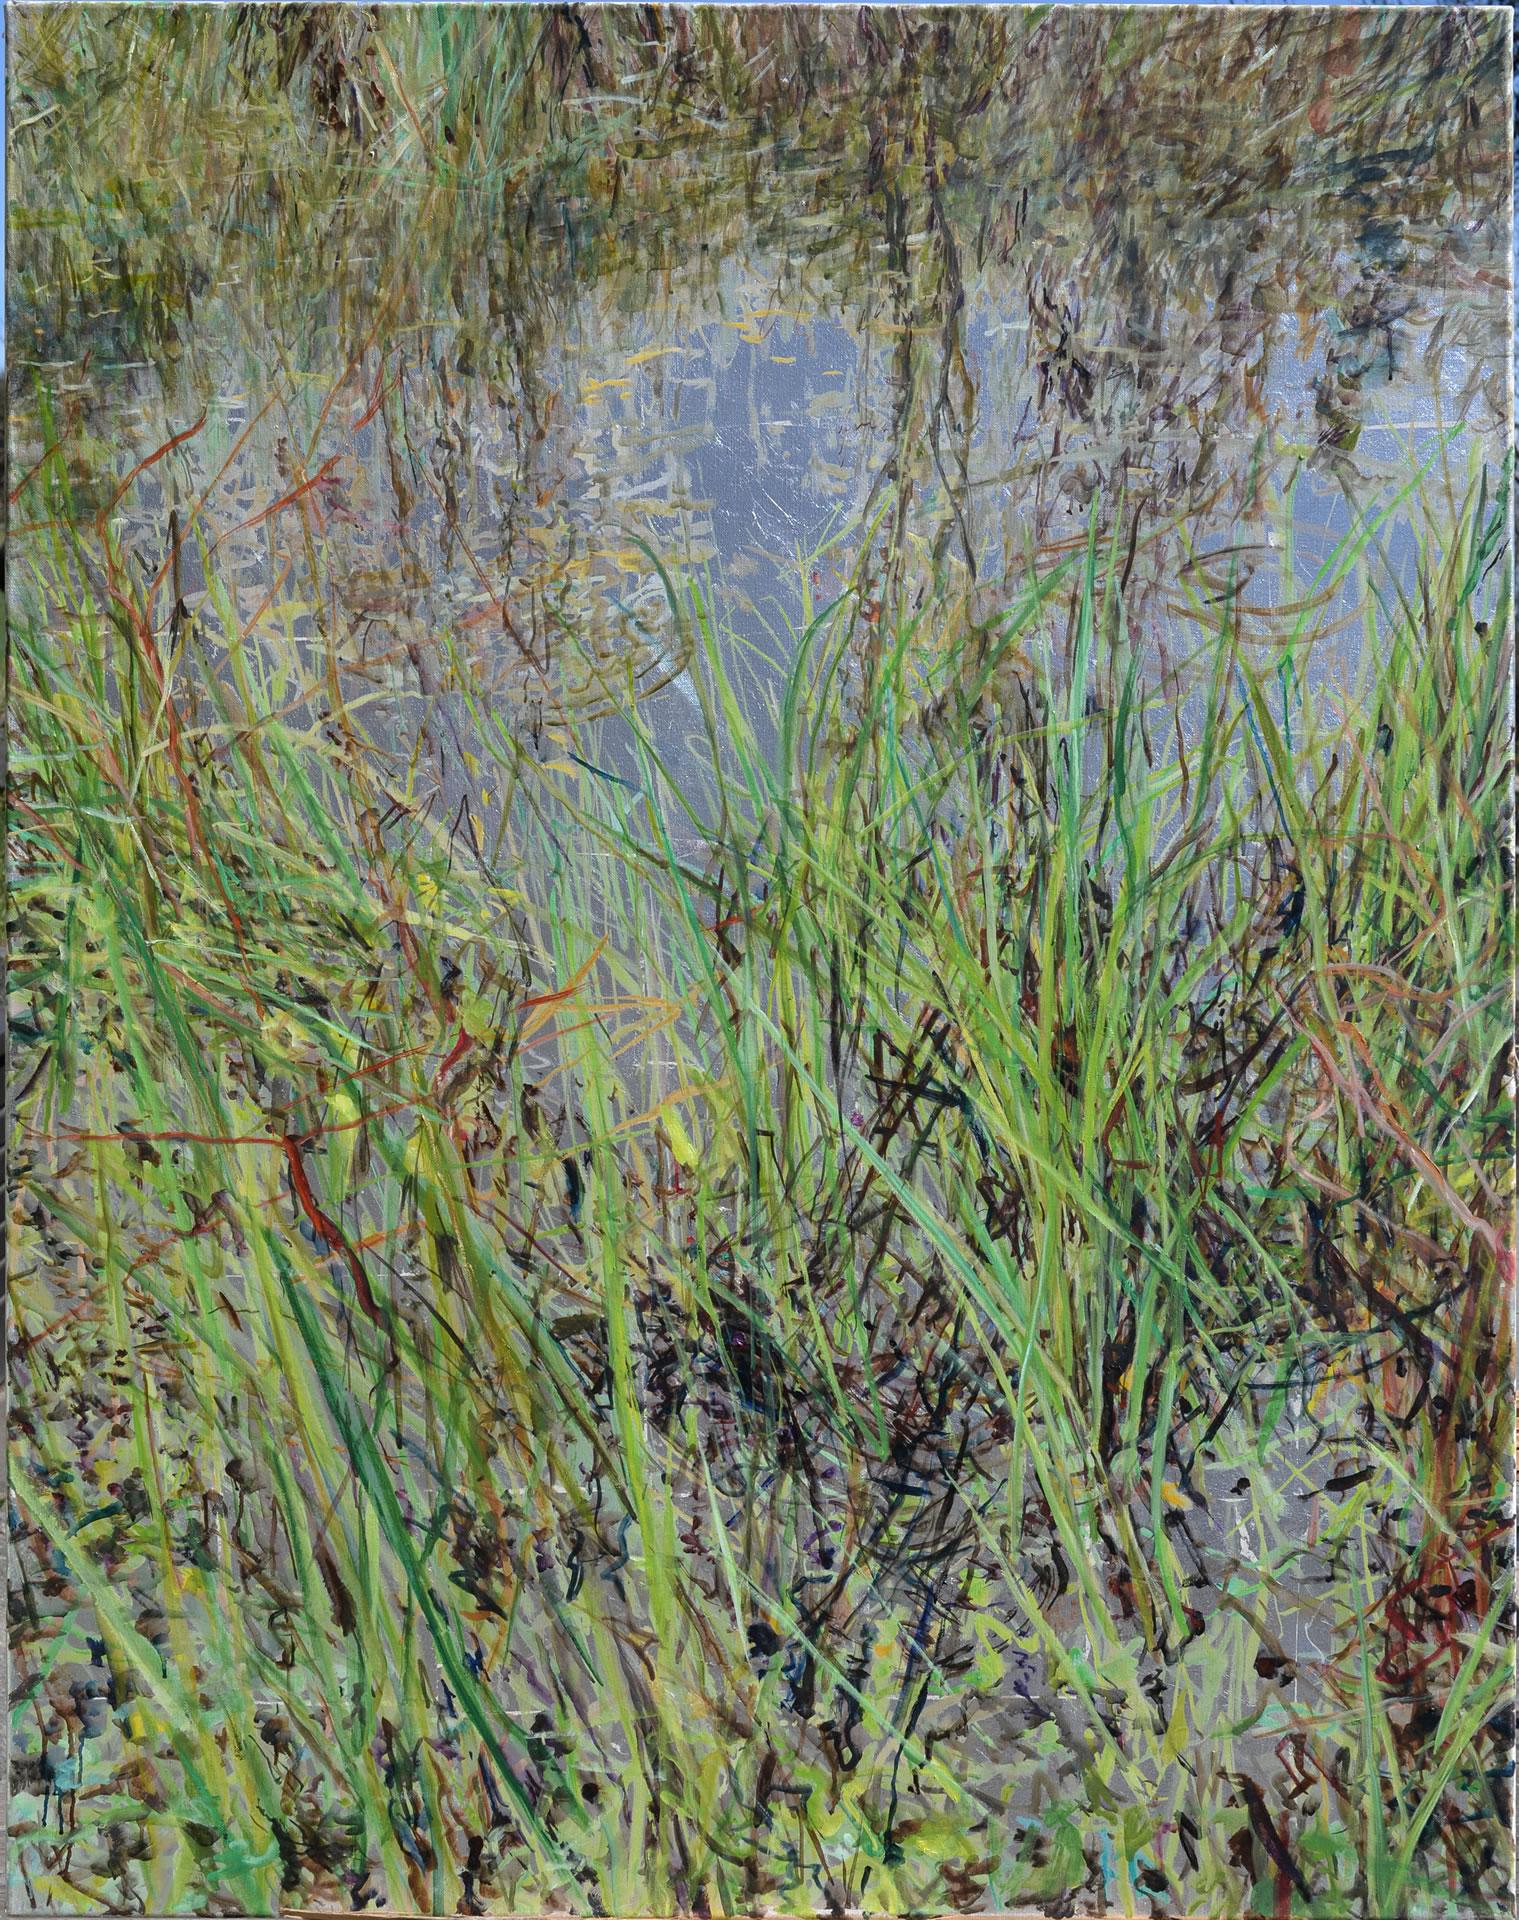 FLUX23 | Markus Orsini-Rosenberg | Reflexion Teich Frühling 2 | 2015 | 140 x 110 cm